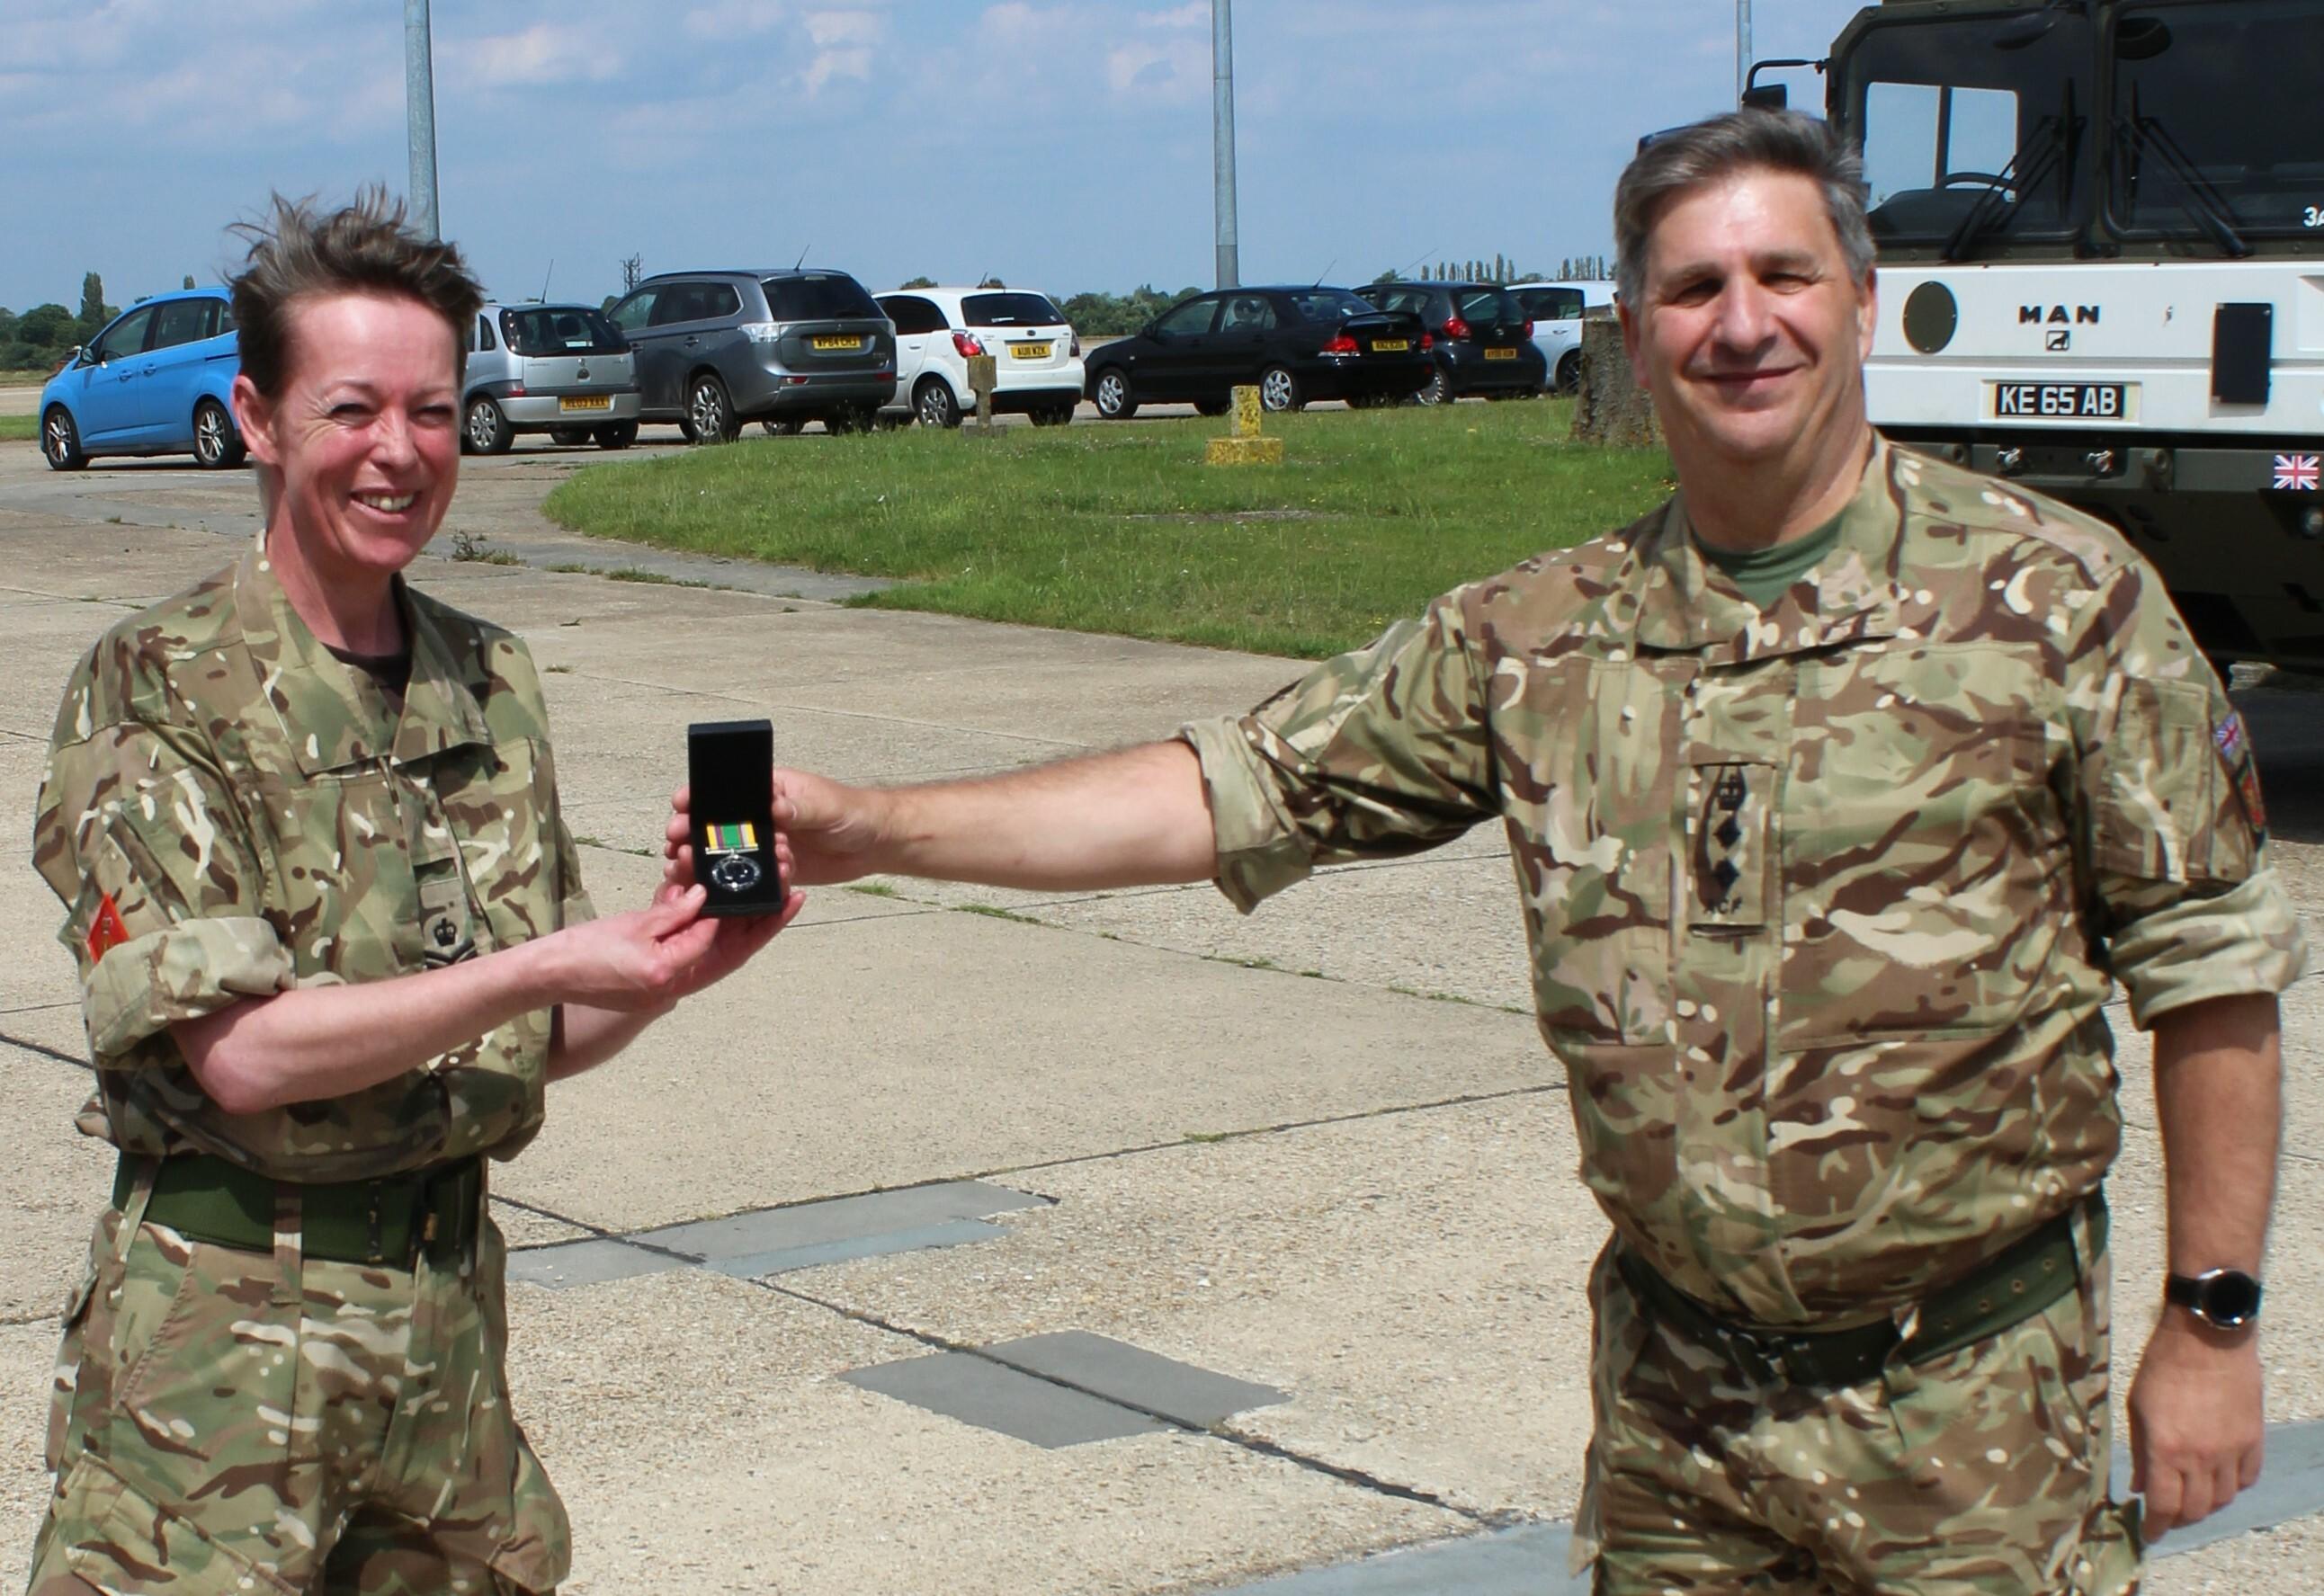 Award of the Cadet Force Medal to SSI T Jemison